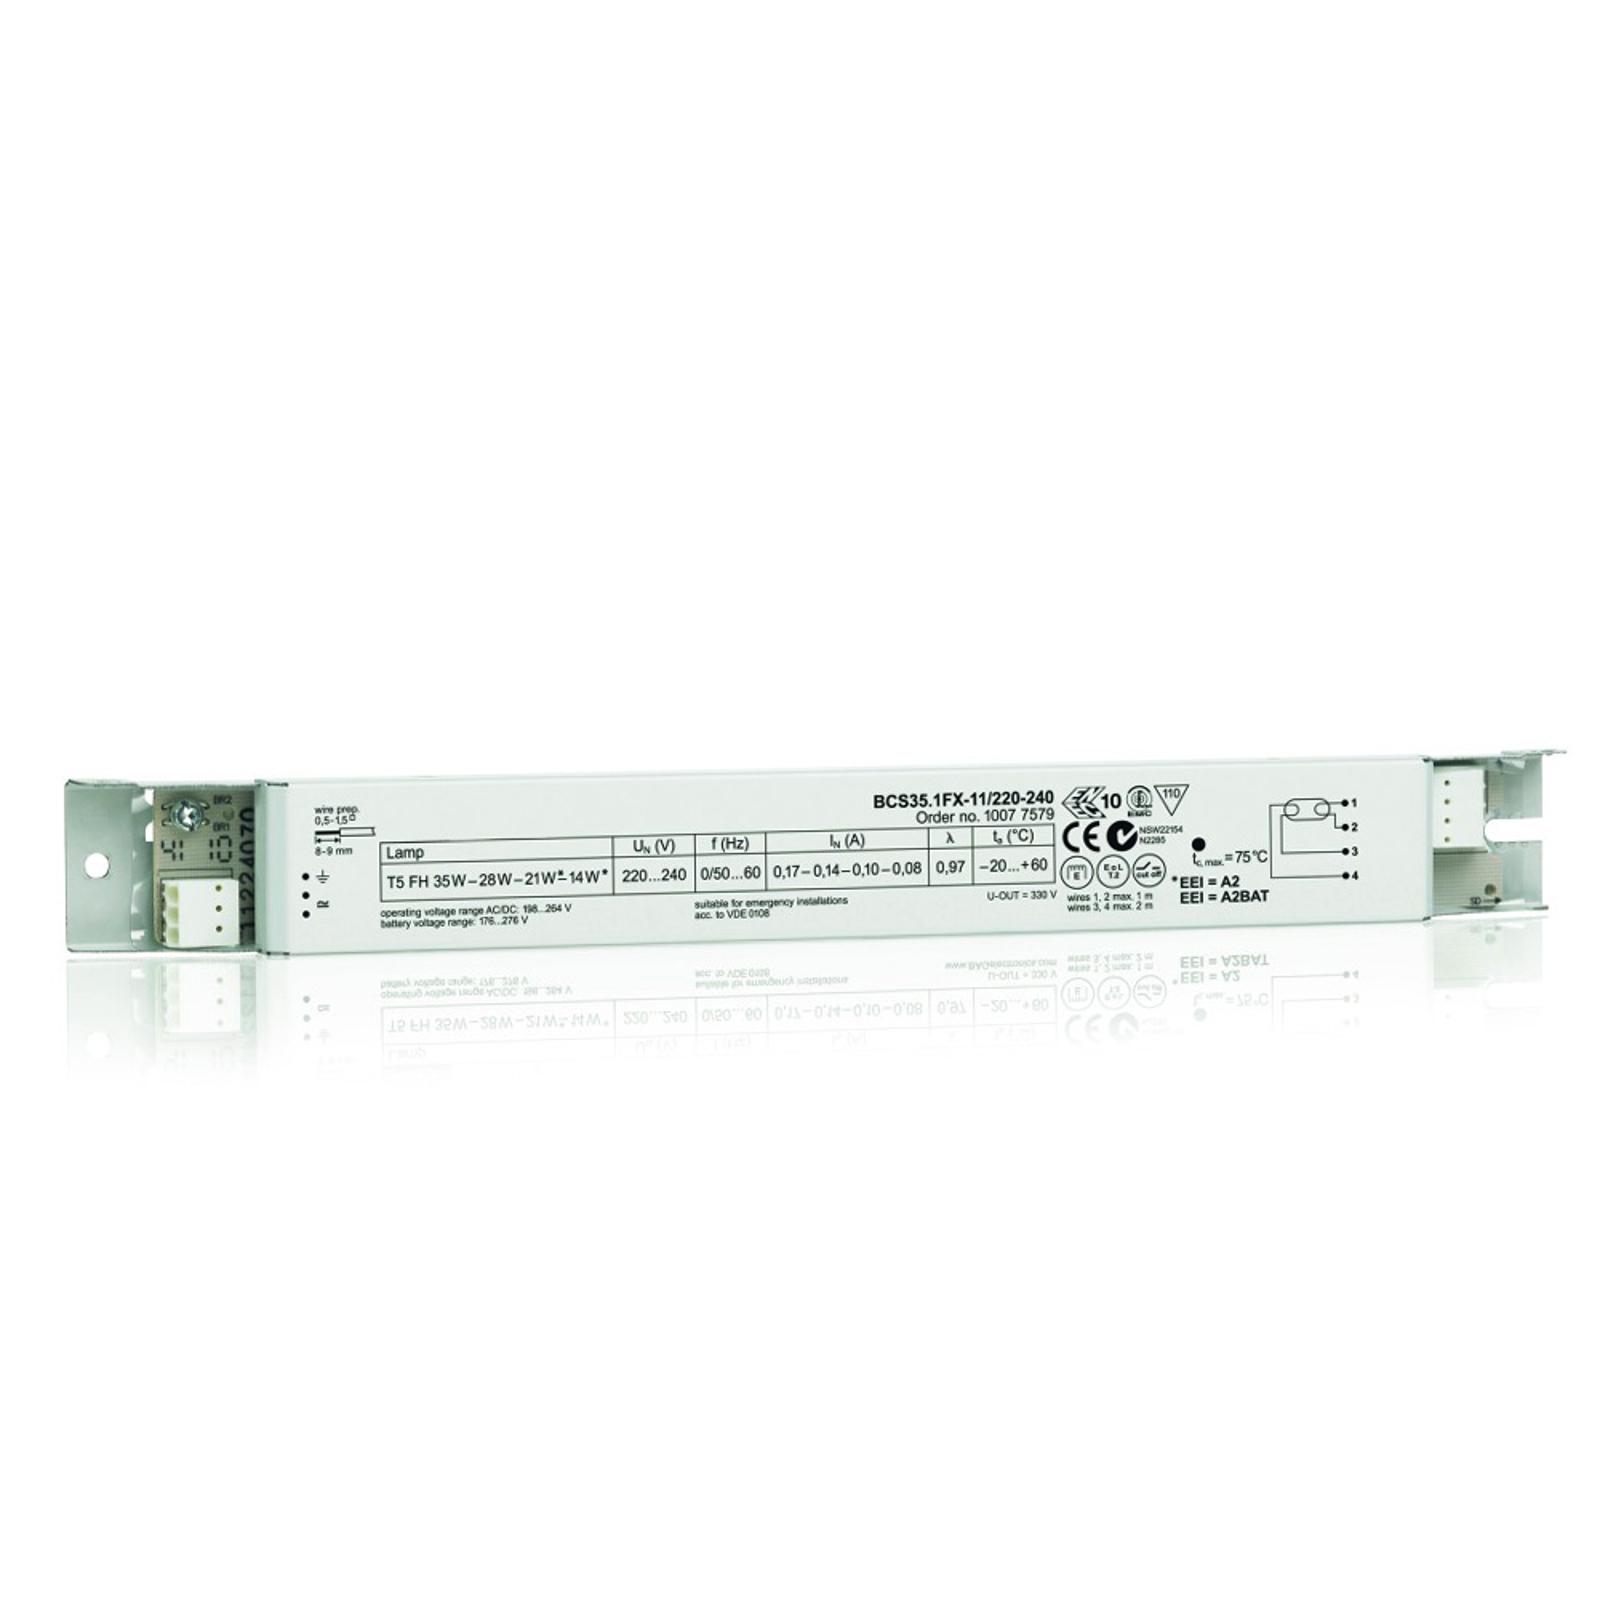 EVG BCS35.1FX-11/220-240 14-35 W T5